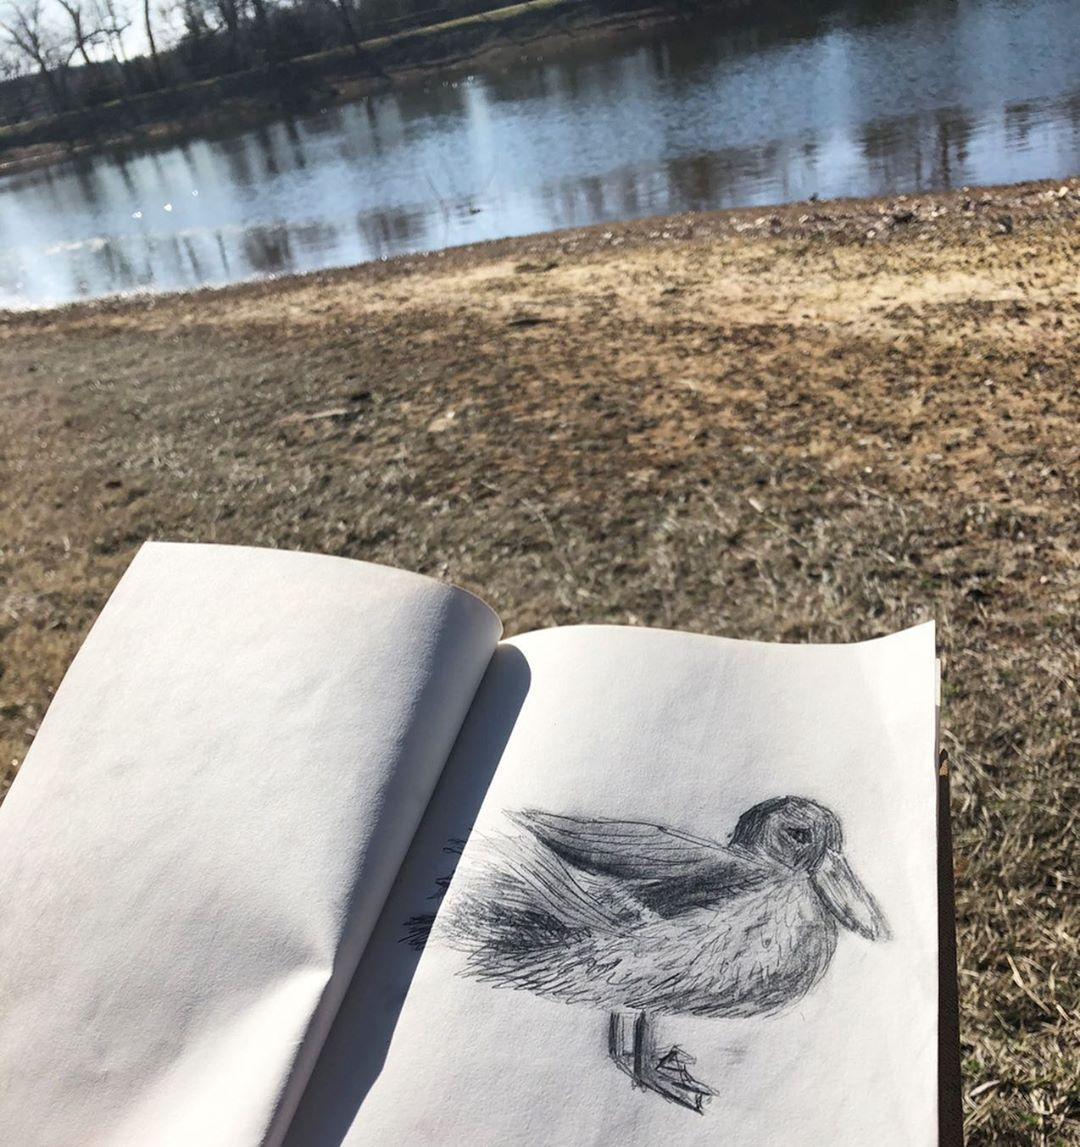 Trying to draw live ducks is very difficult, my friends. 😂 But at least the day today was nice! . . #birdsketch #birdsketches #drawing✏ #sketch #sketching #sketchbookdrawing #sketchbooks #pencildrawing #pencilsketch #pencilart #pencilartwork #blackandwhite #bird #birds #birdart #birddrawing #artistsoninstagram #art #artistsofinstagram #artistoninstagram #pencil #birdlovers #birdartwork #ducks #ducksketch #duckdrawing